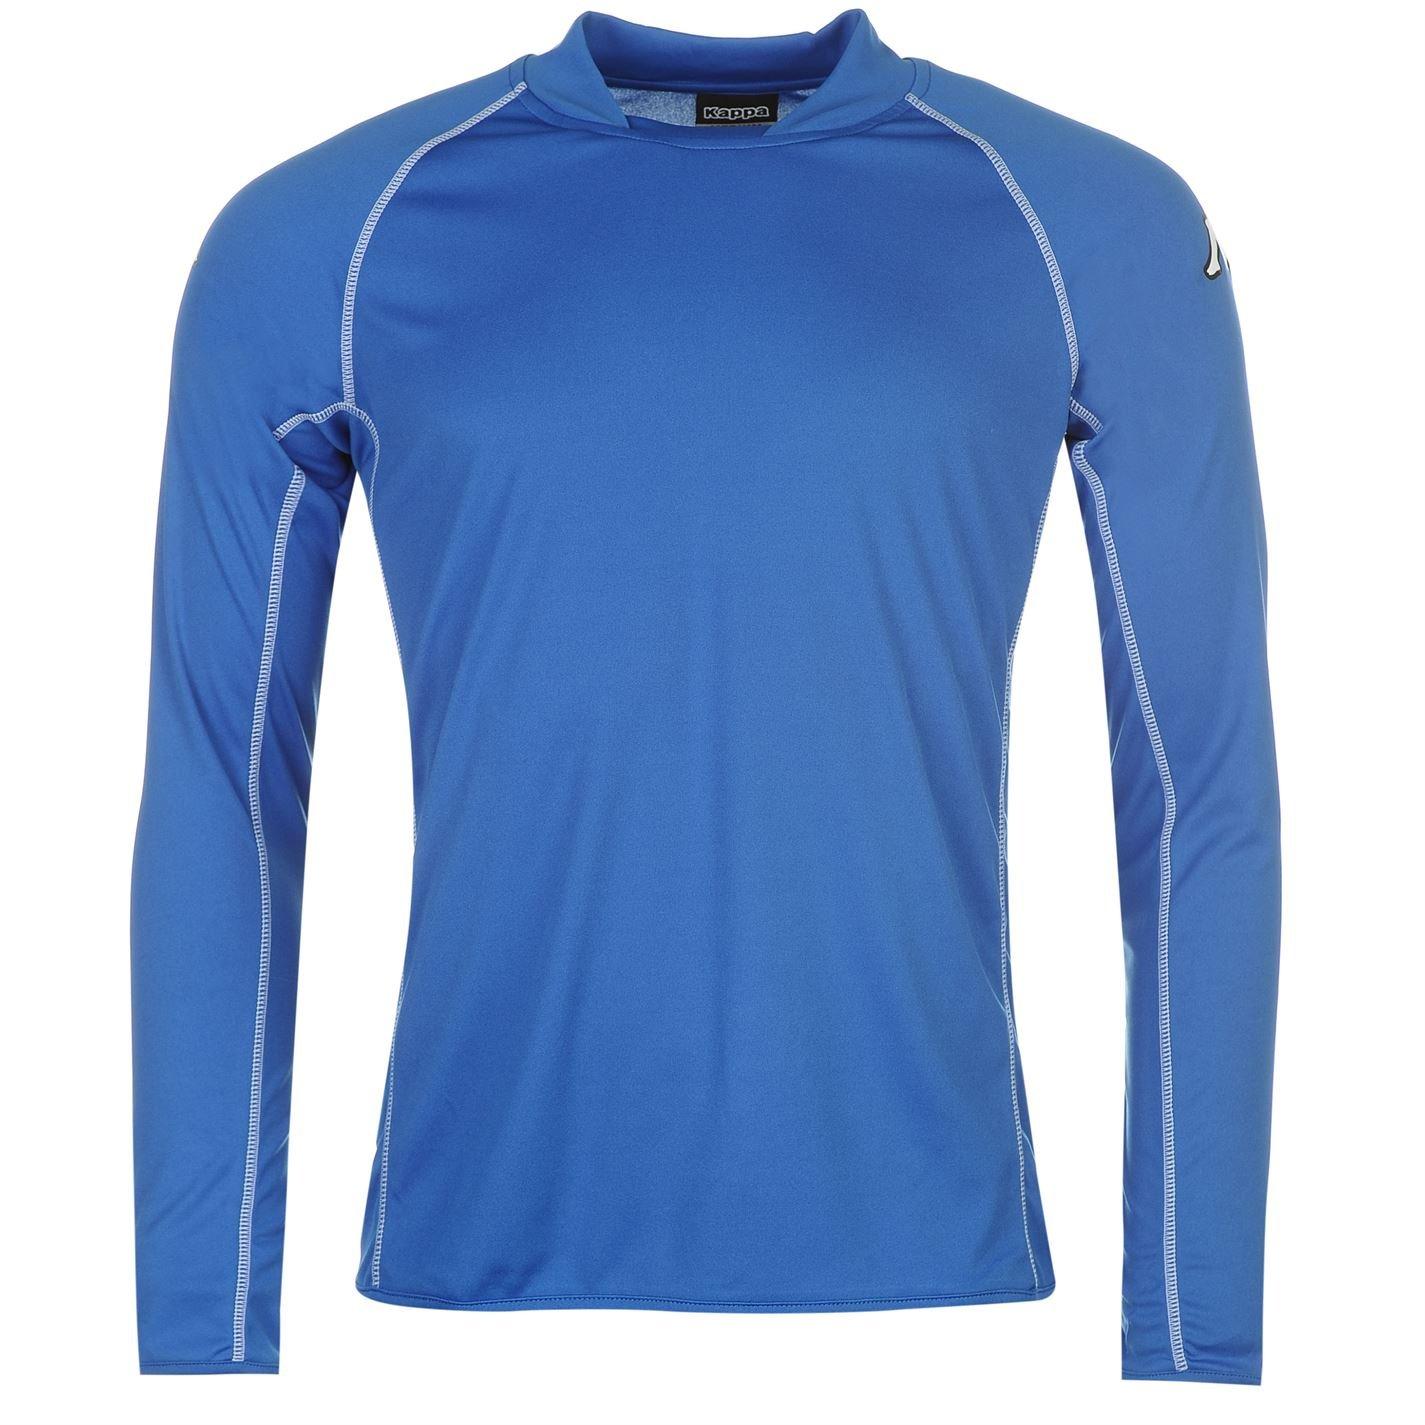 2da196d3148b Kappa Mens Masa Long Sleeve Football T Shirt Tee Top Lightweight Tonal  Stitching